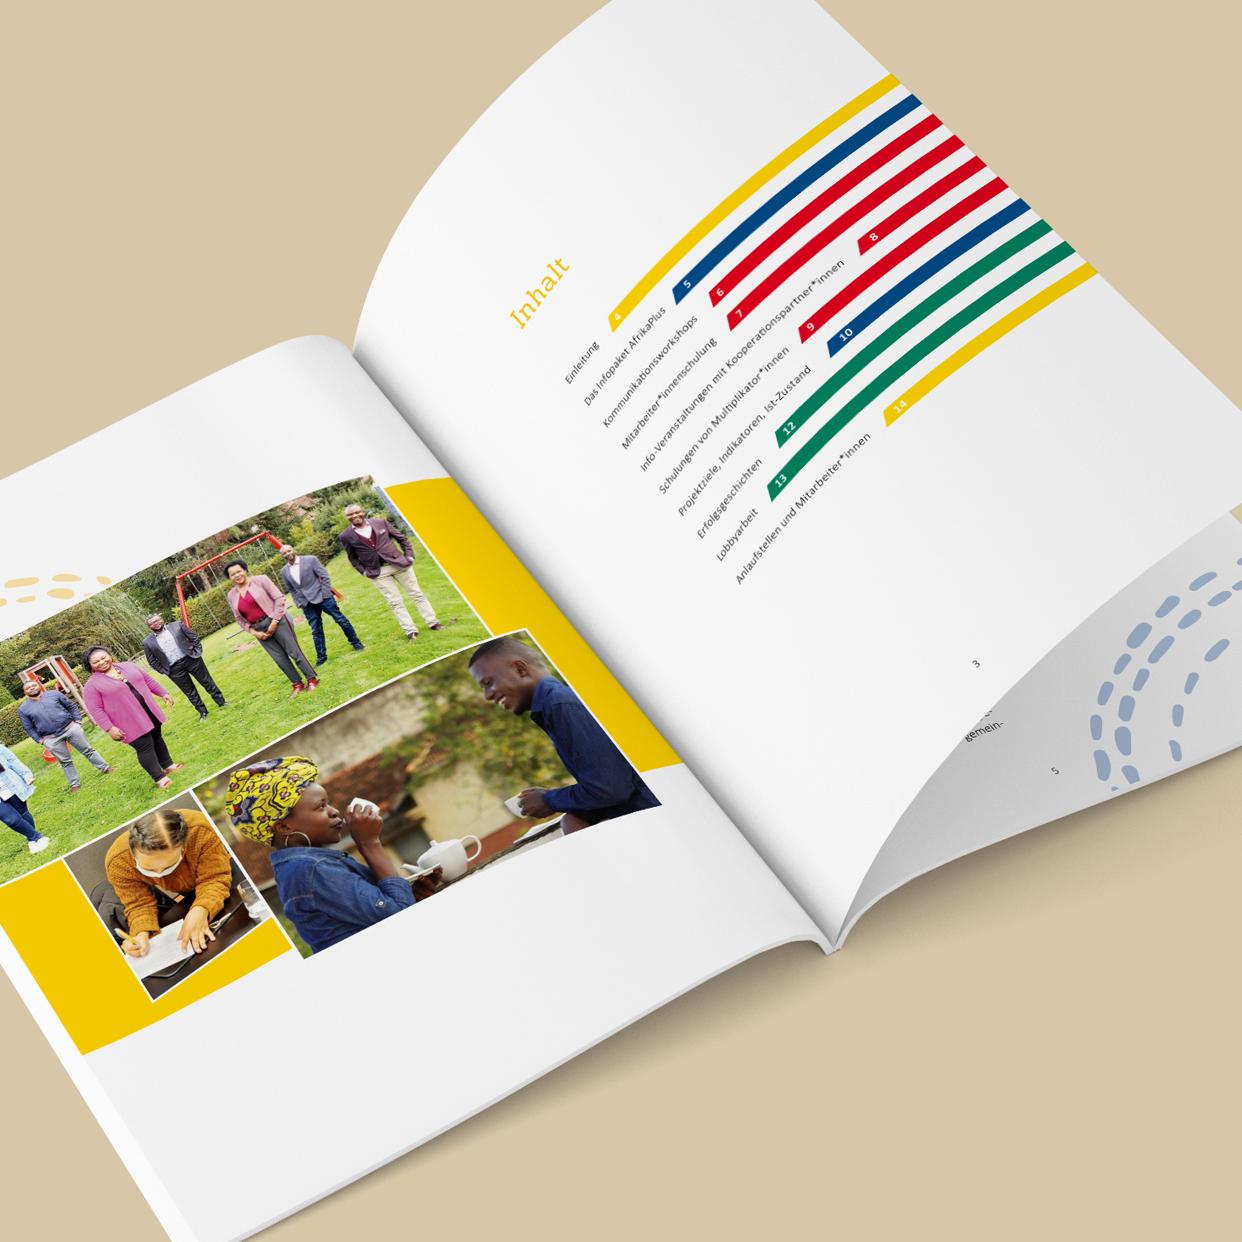 TANG-AfrikaPlus-brochure-Inhalt